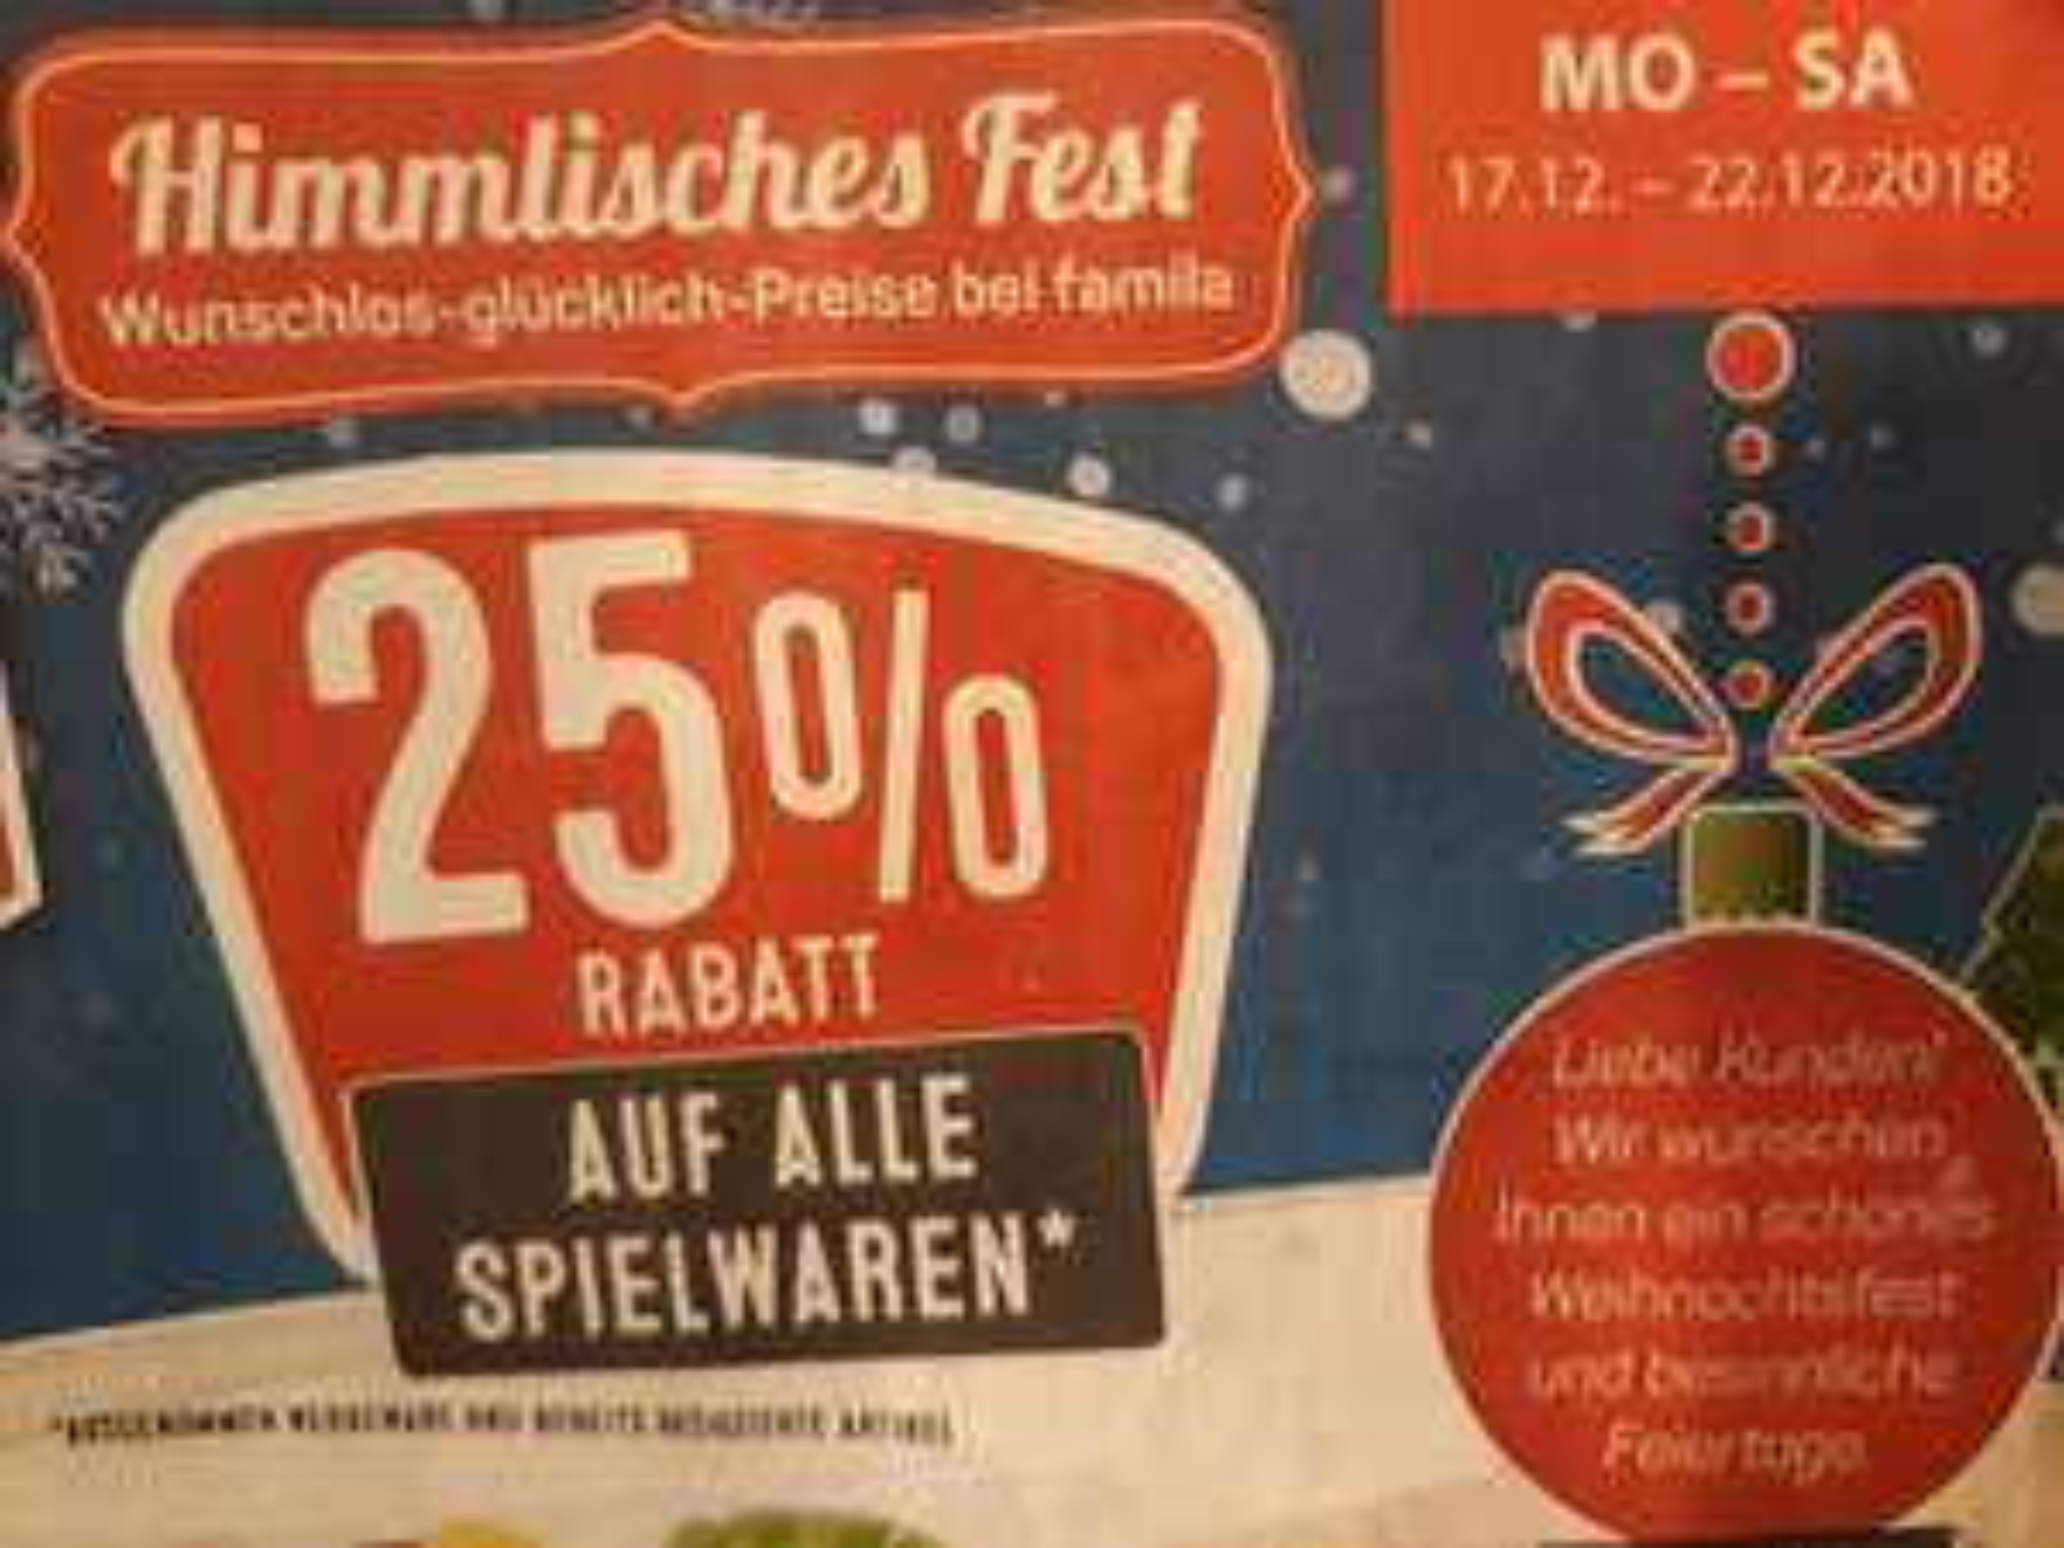 Bomann Kühlschrank Famila : Famila nordwest angebote deals ⇒ januar mydealz